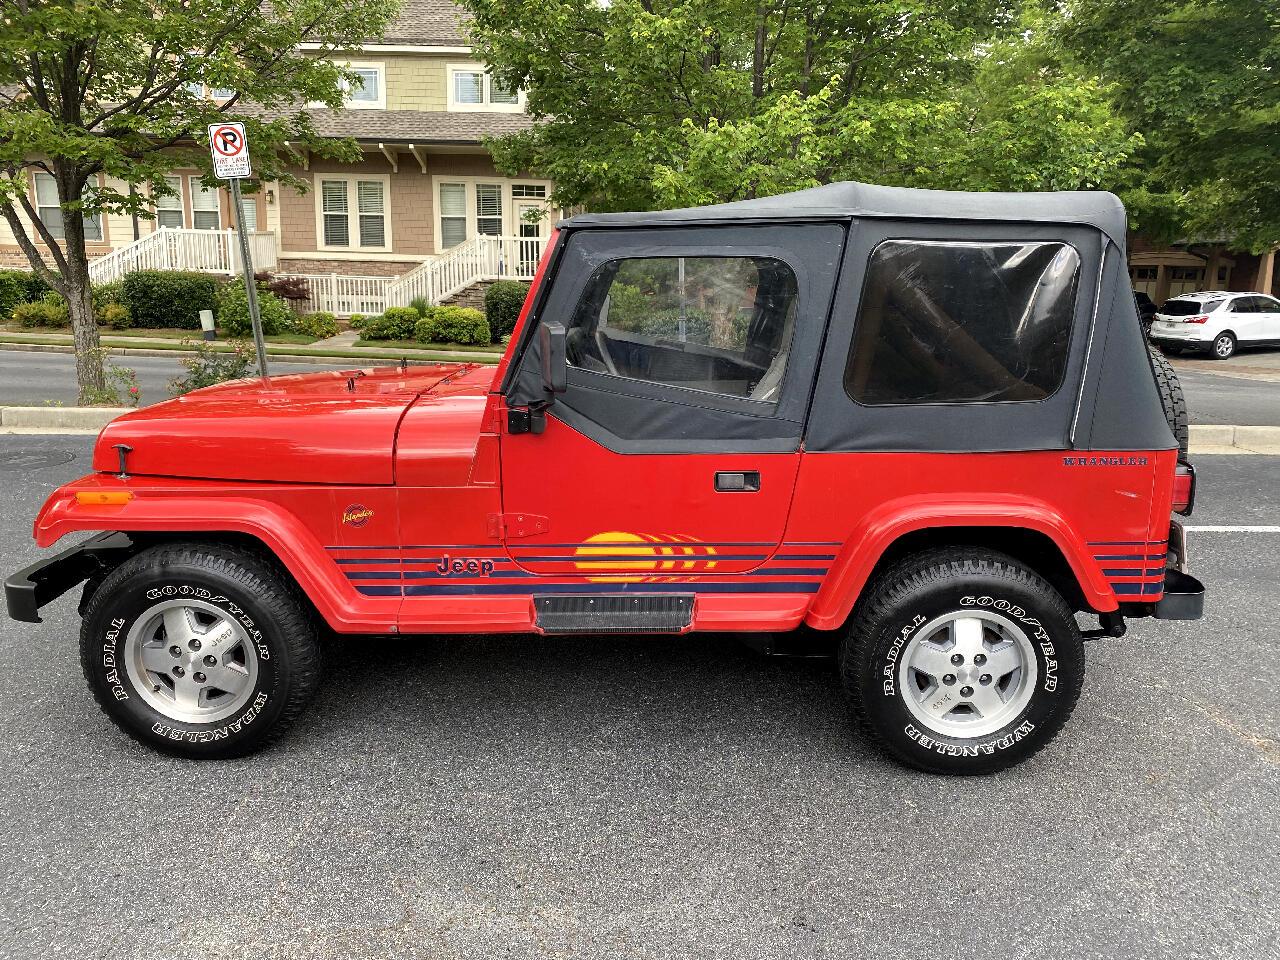 Jeep Wrangler Islander Soft Top 1989